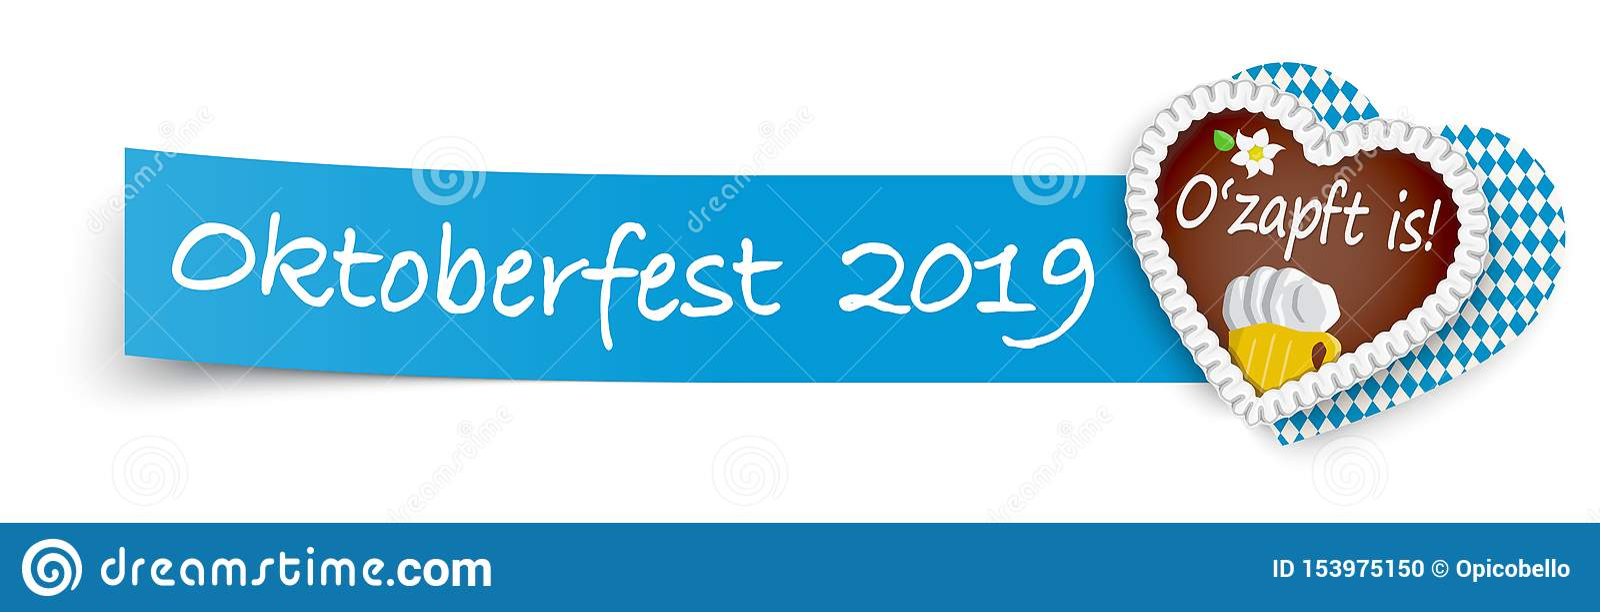 Blauw kleverig document met peperkoekhart Oktoberfest 2019